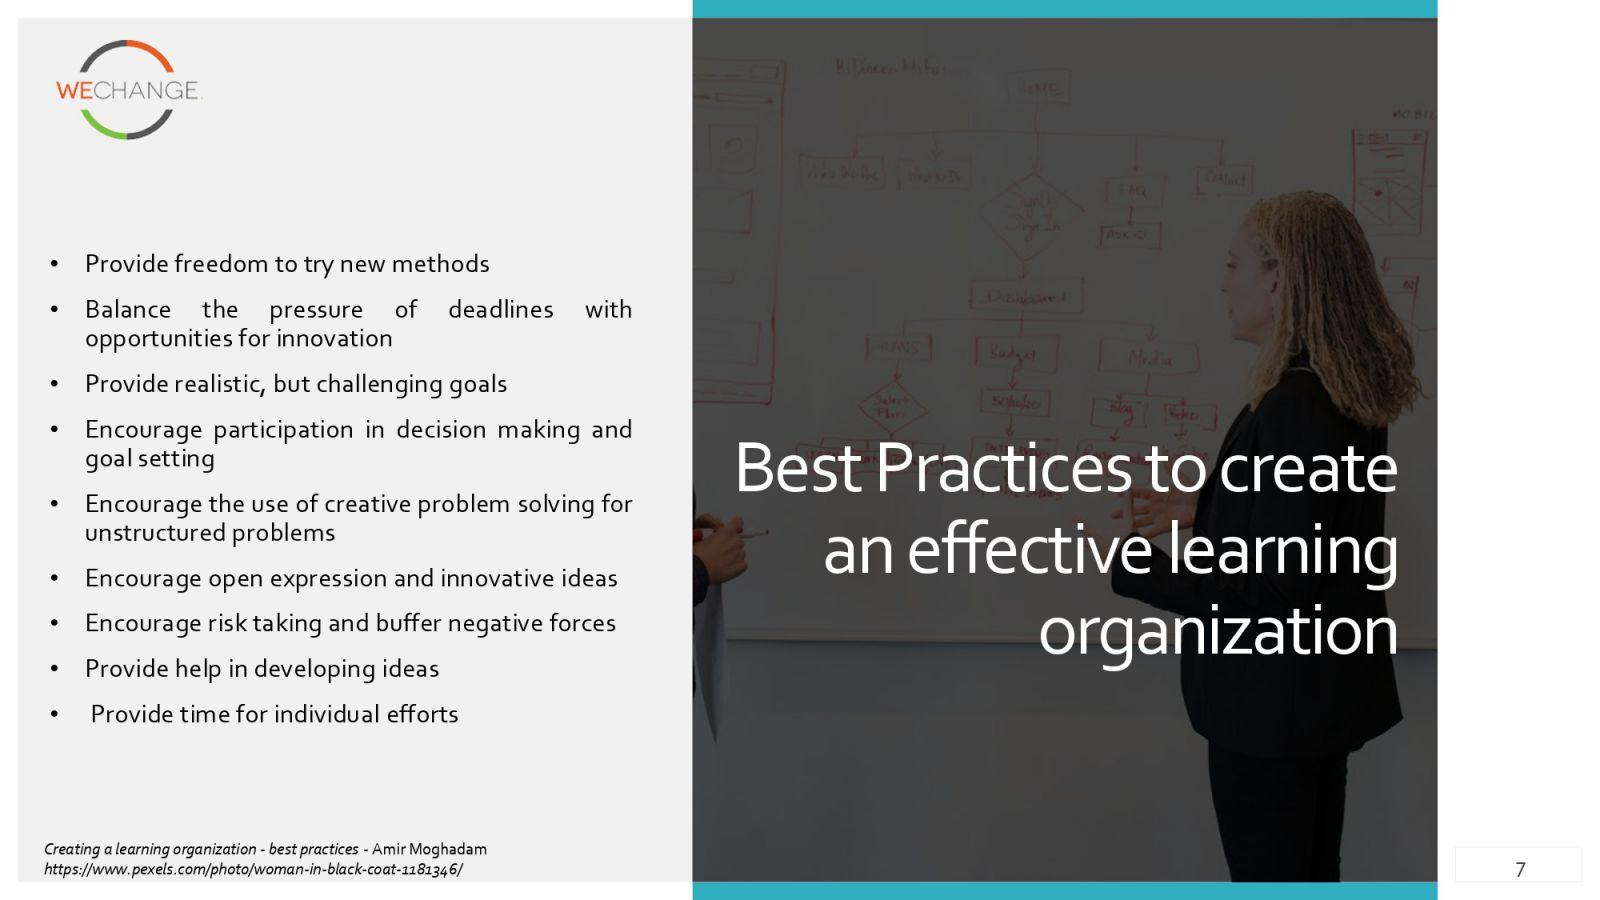 learnin organization in practice page 0007 compressed The learning organization in practice